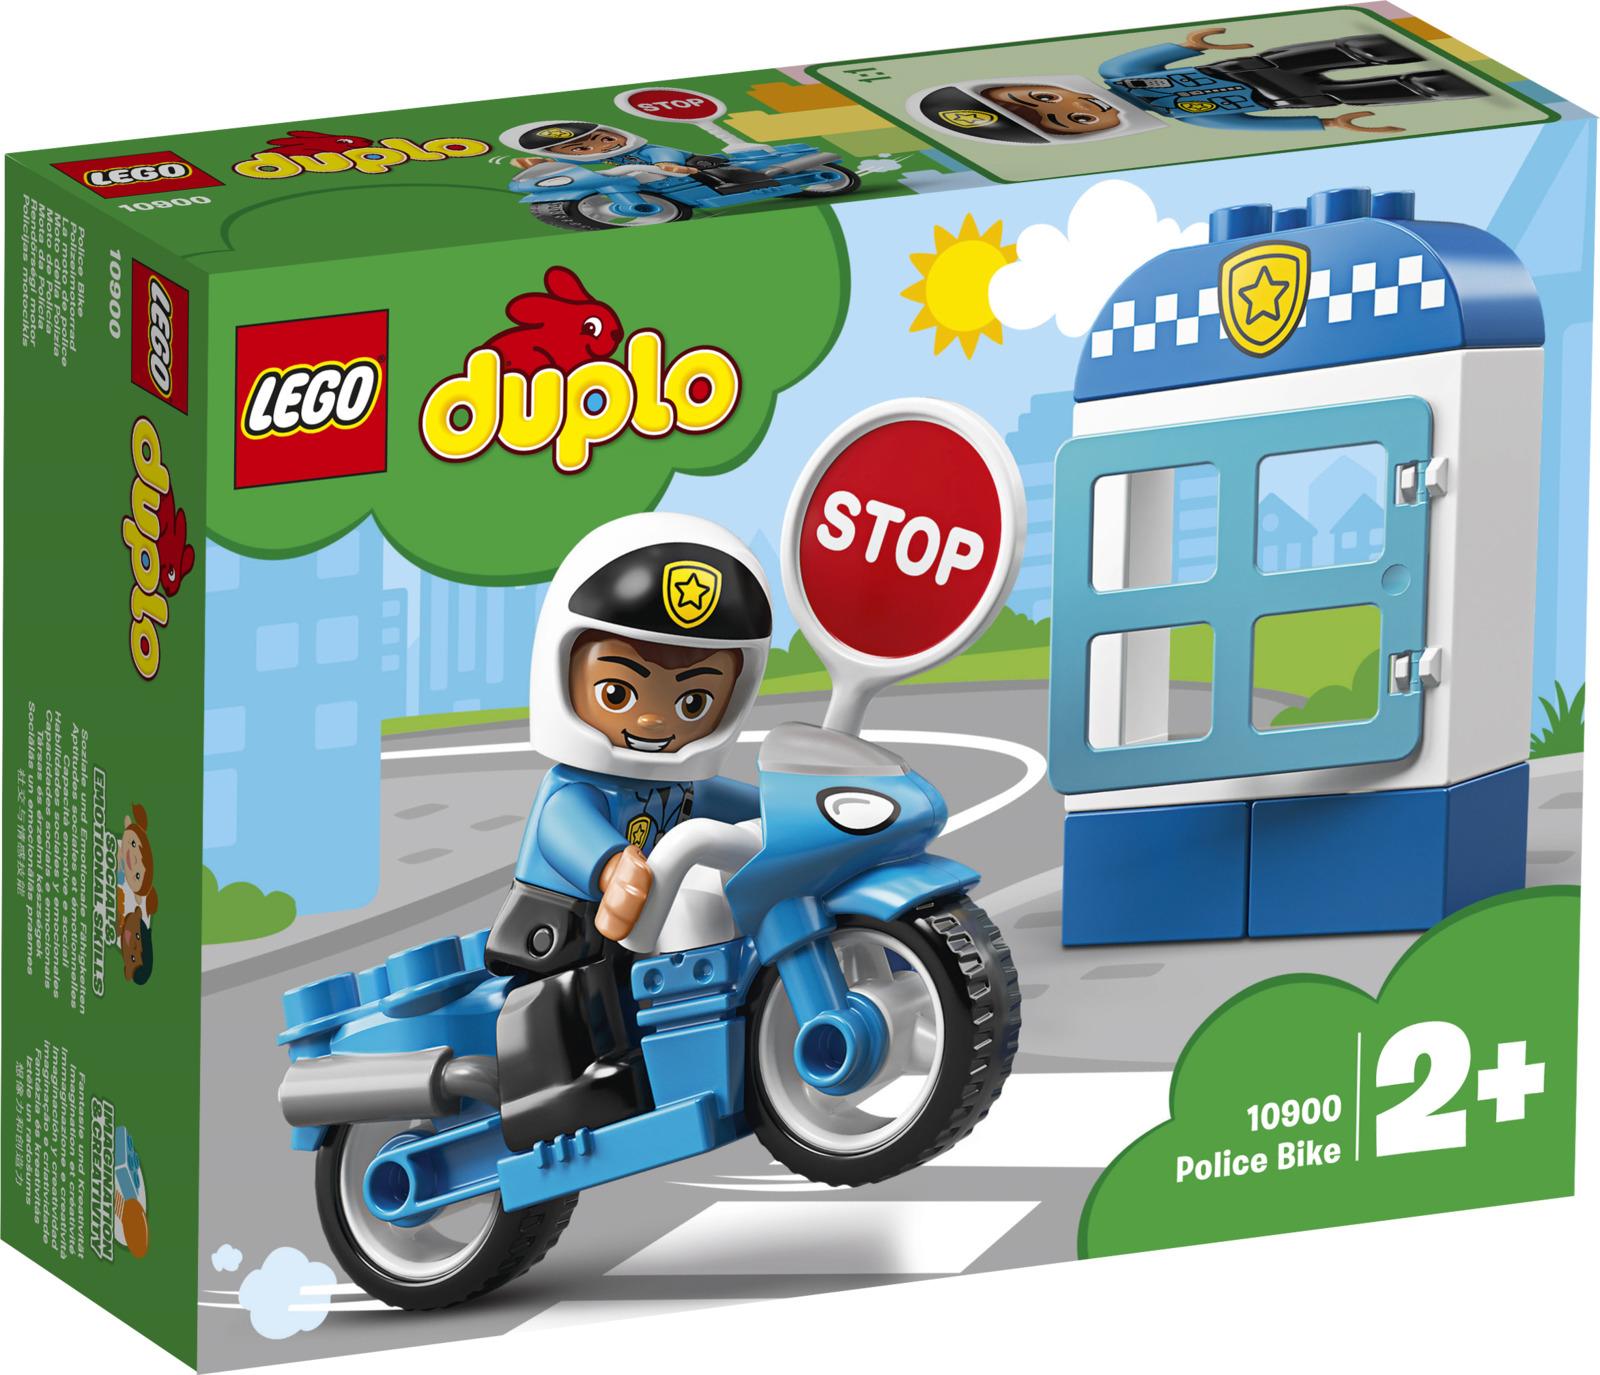 LEGO DUPLO Town 10900 Полицейский мотоцикл Конструктор